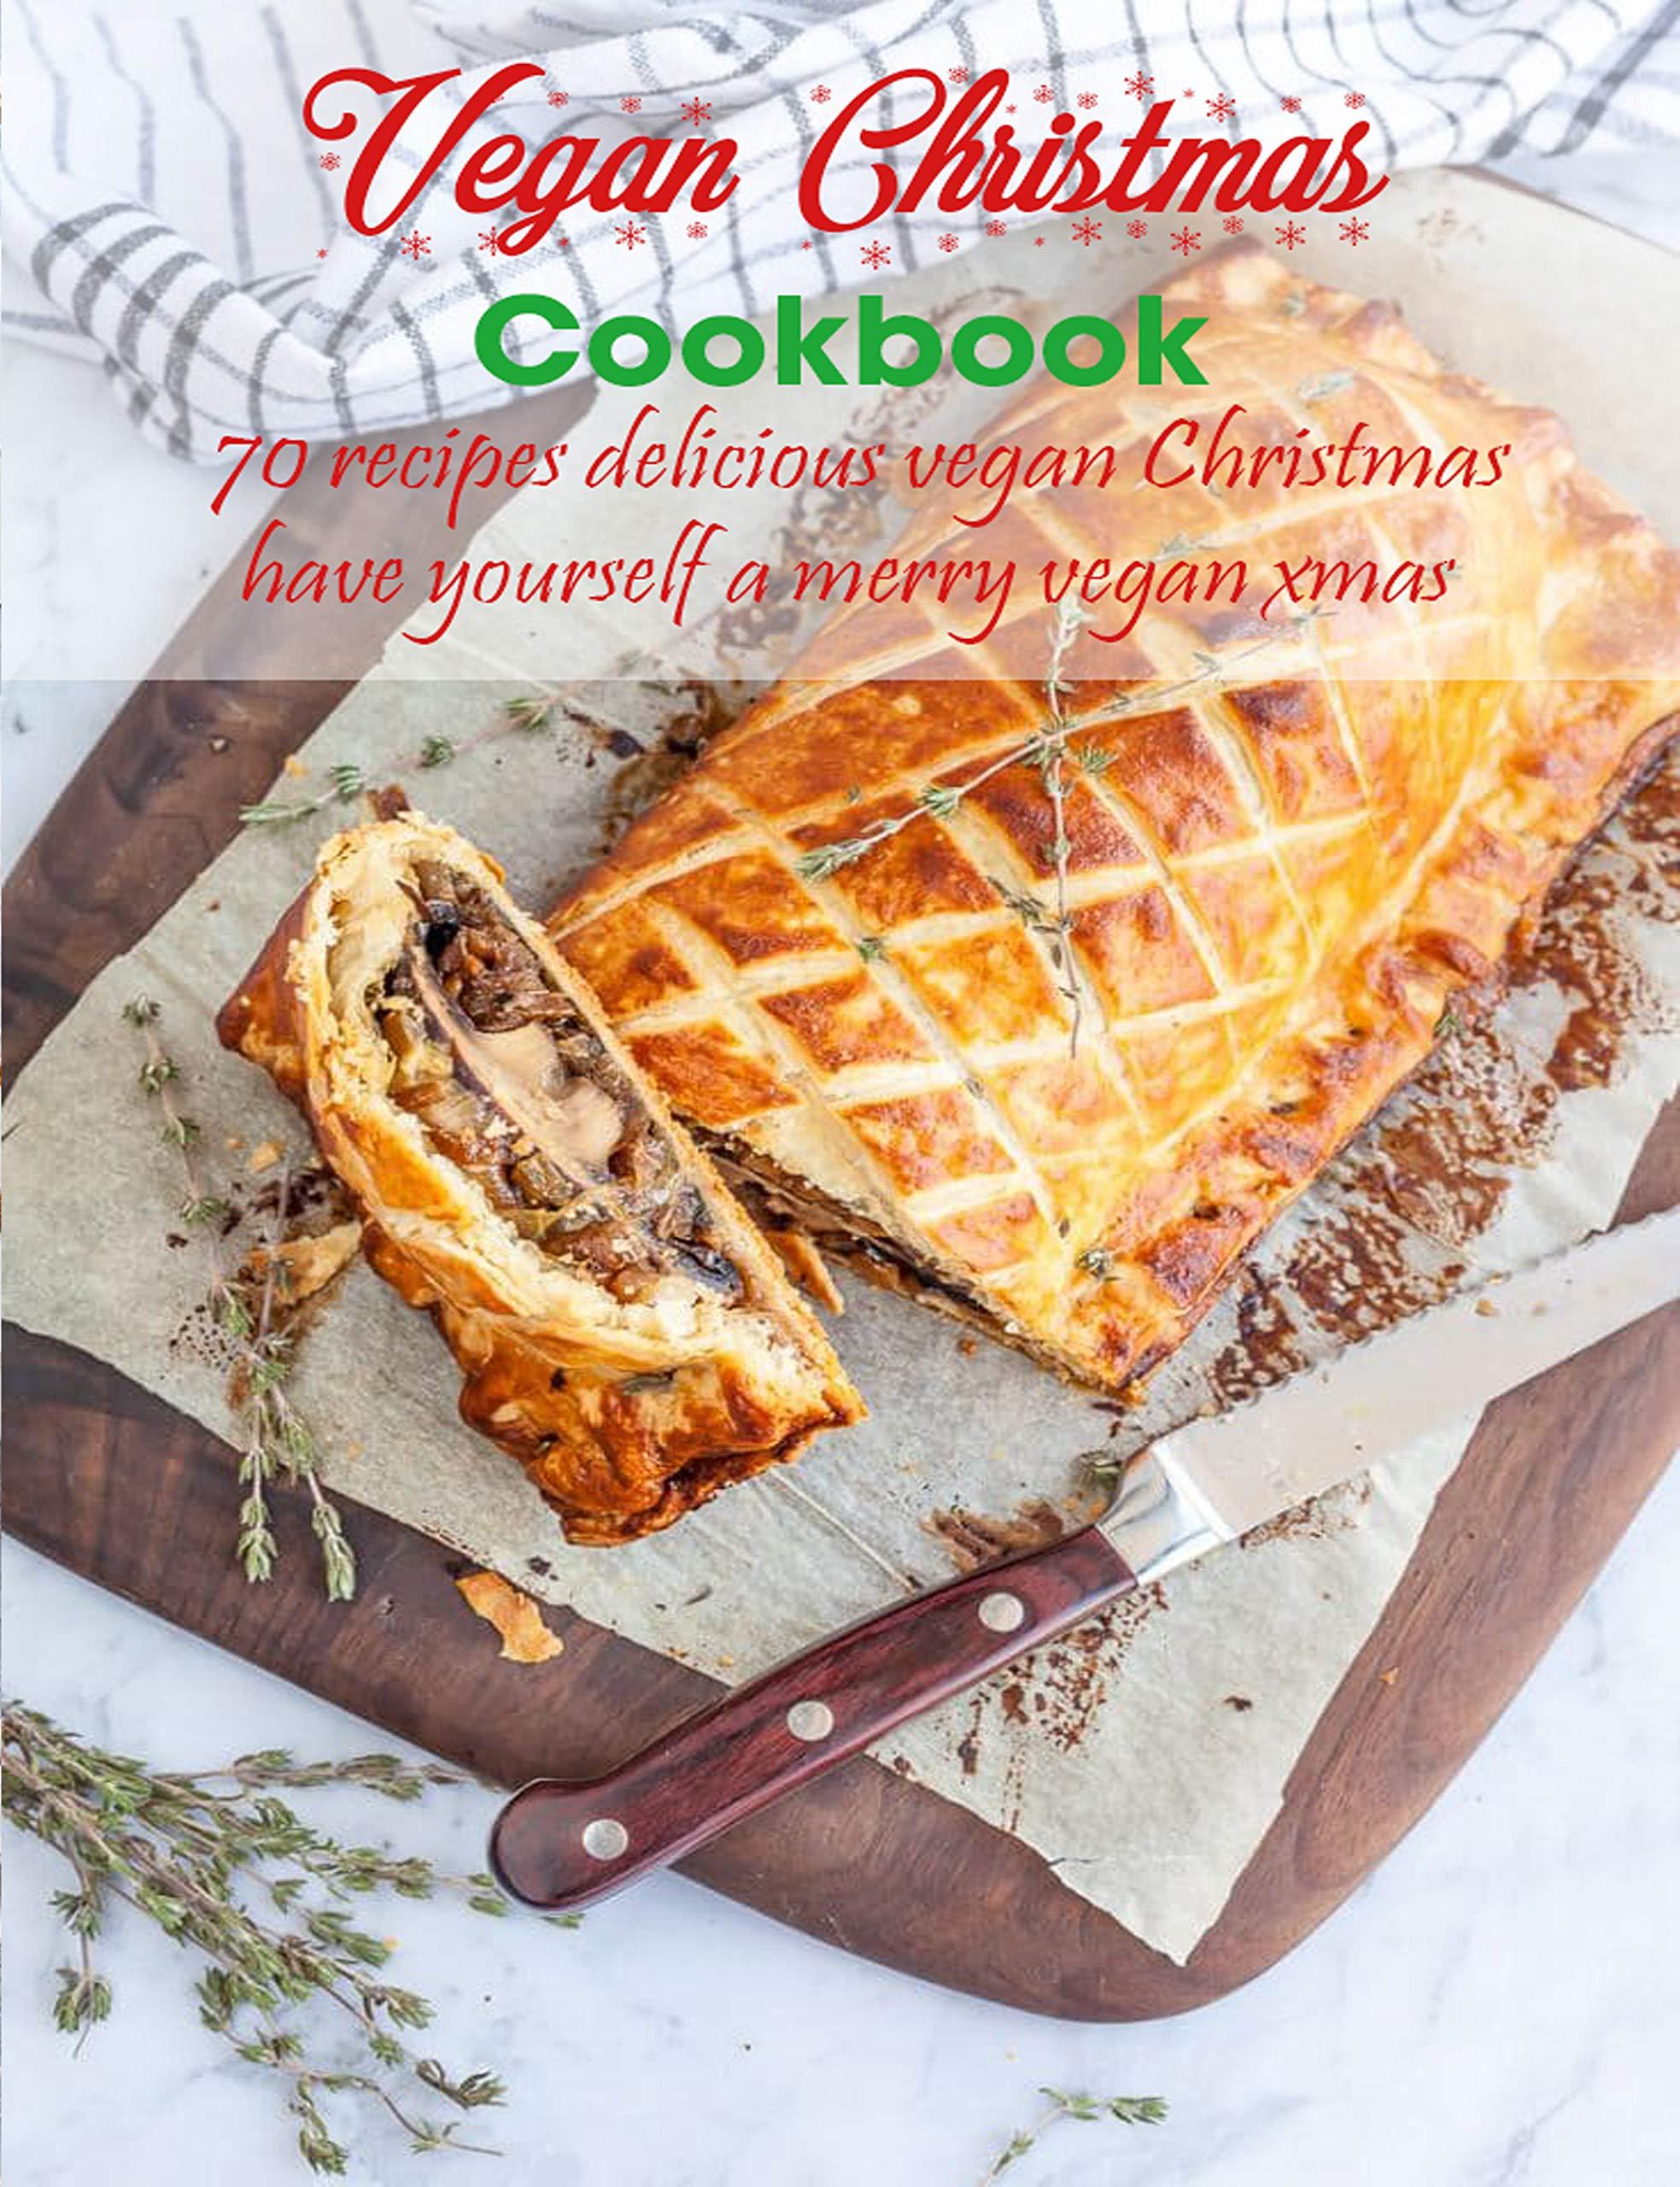 Vegan Christmas Cookbook: 70 recipes delicious vegan christmas , have yourself a merry vegan xmas